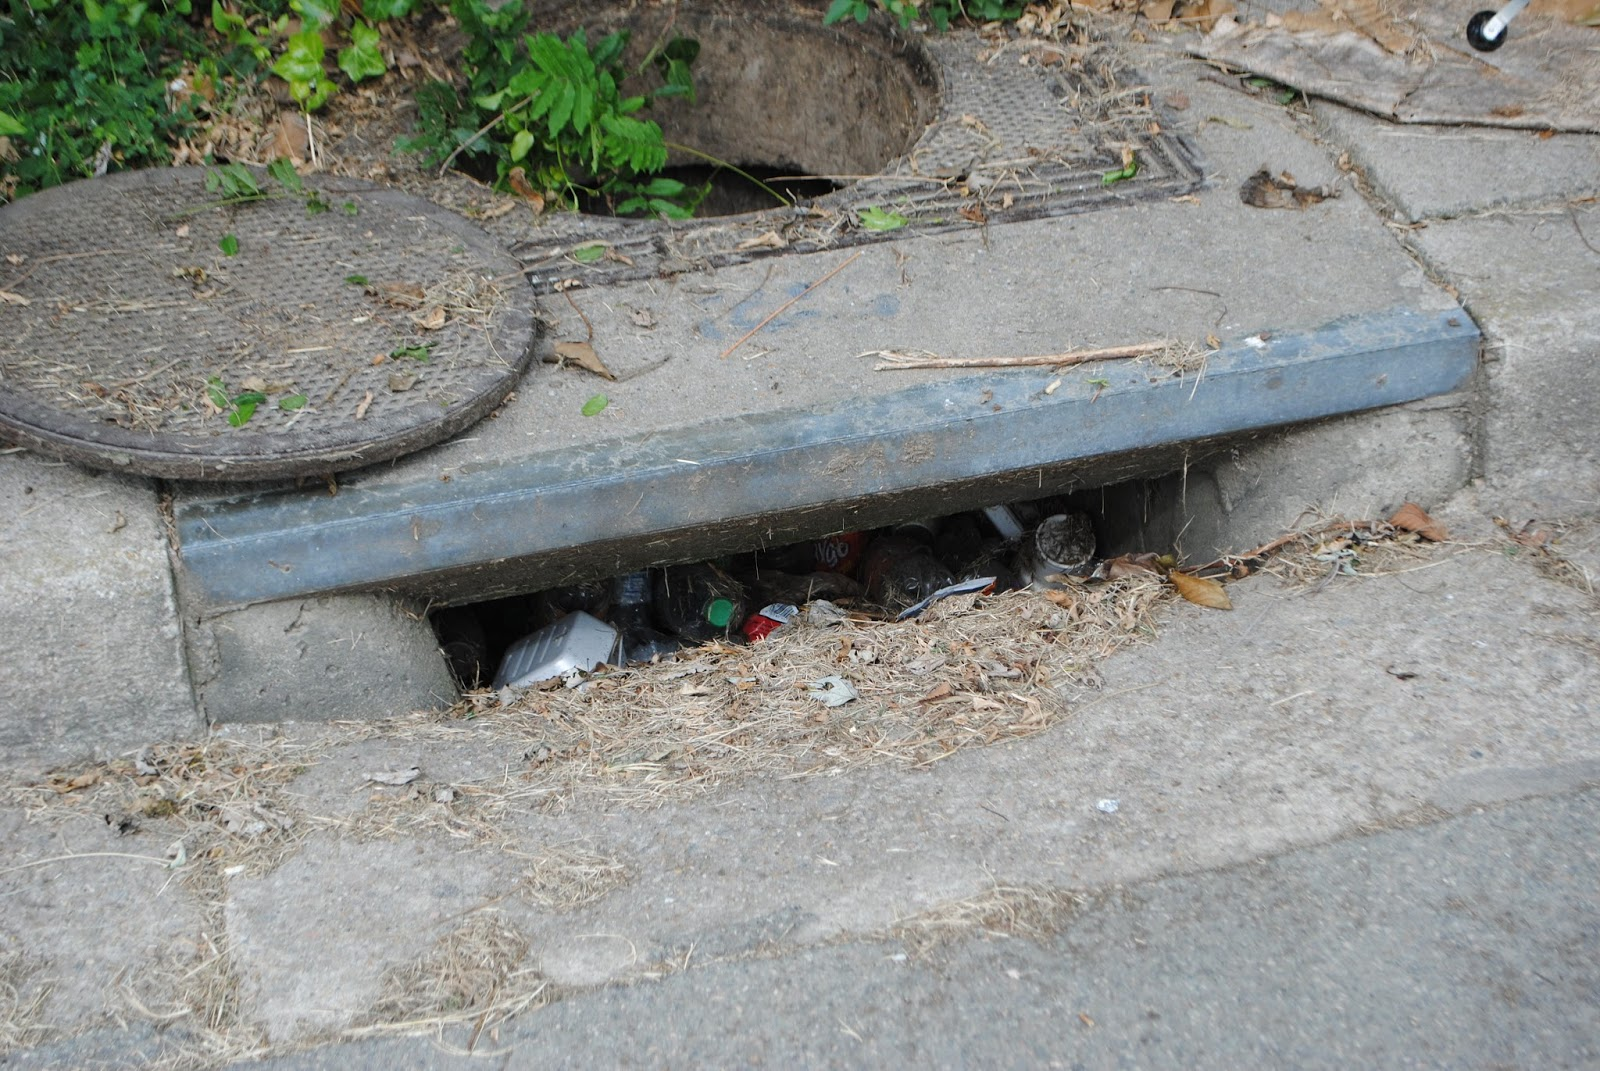 City Of Richmond Department Of Public Utilities